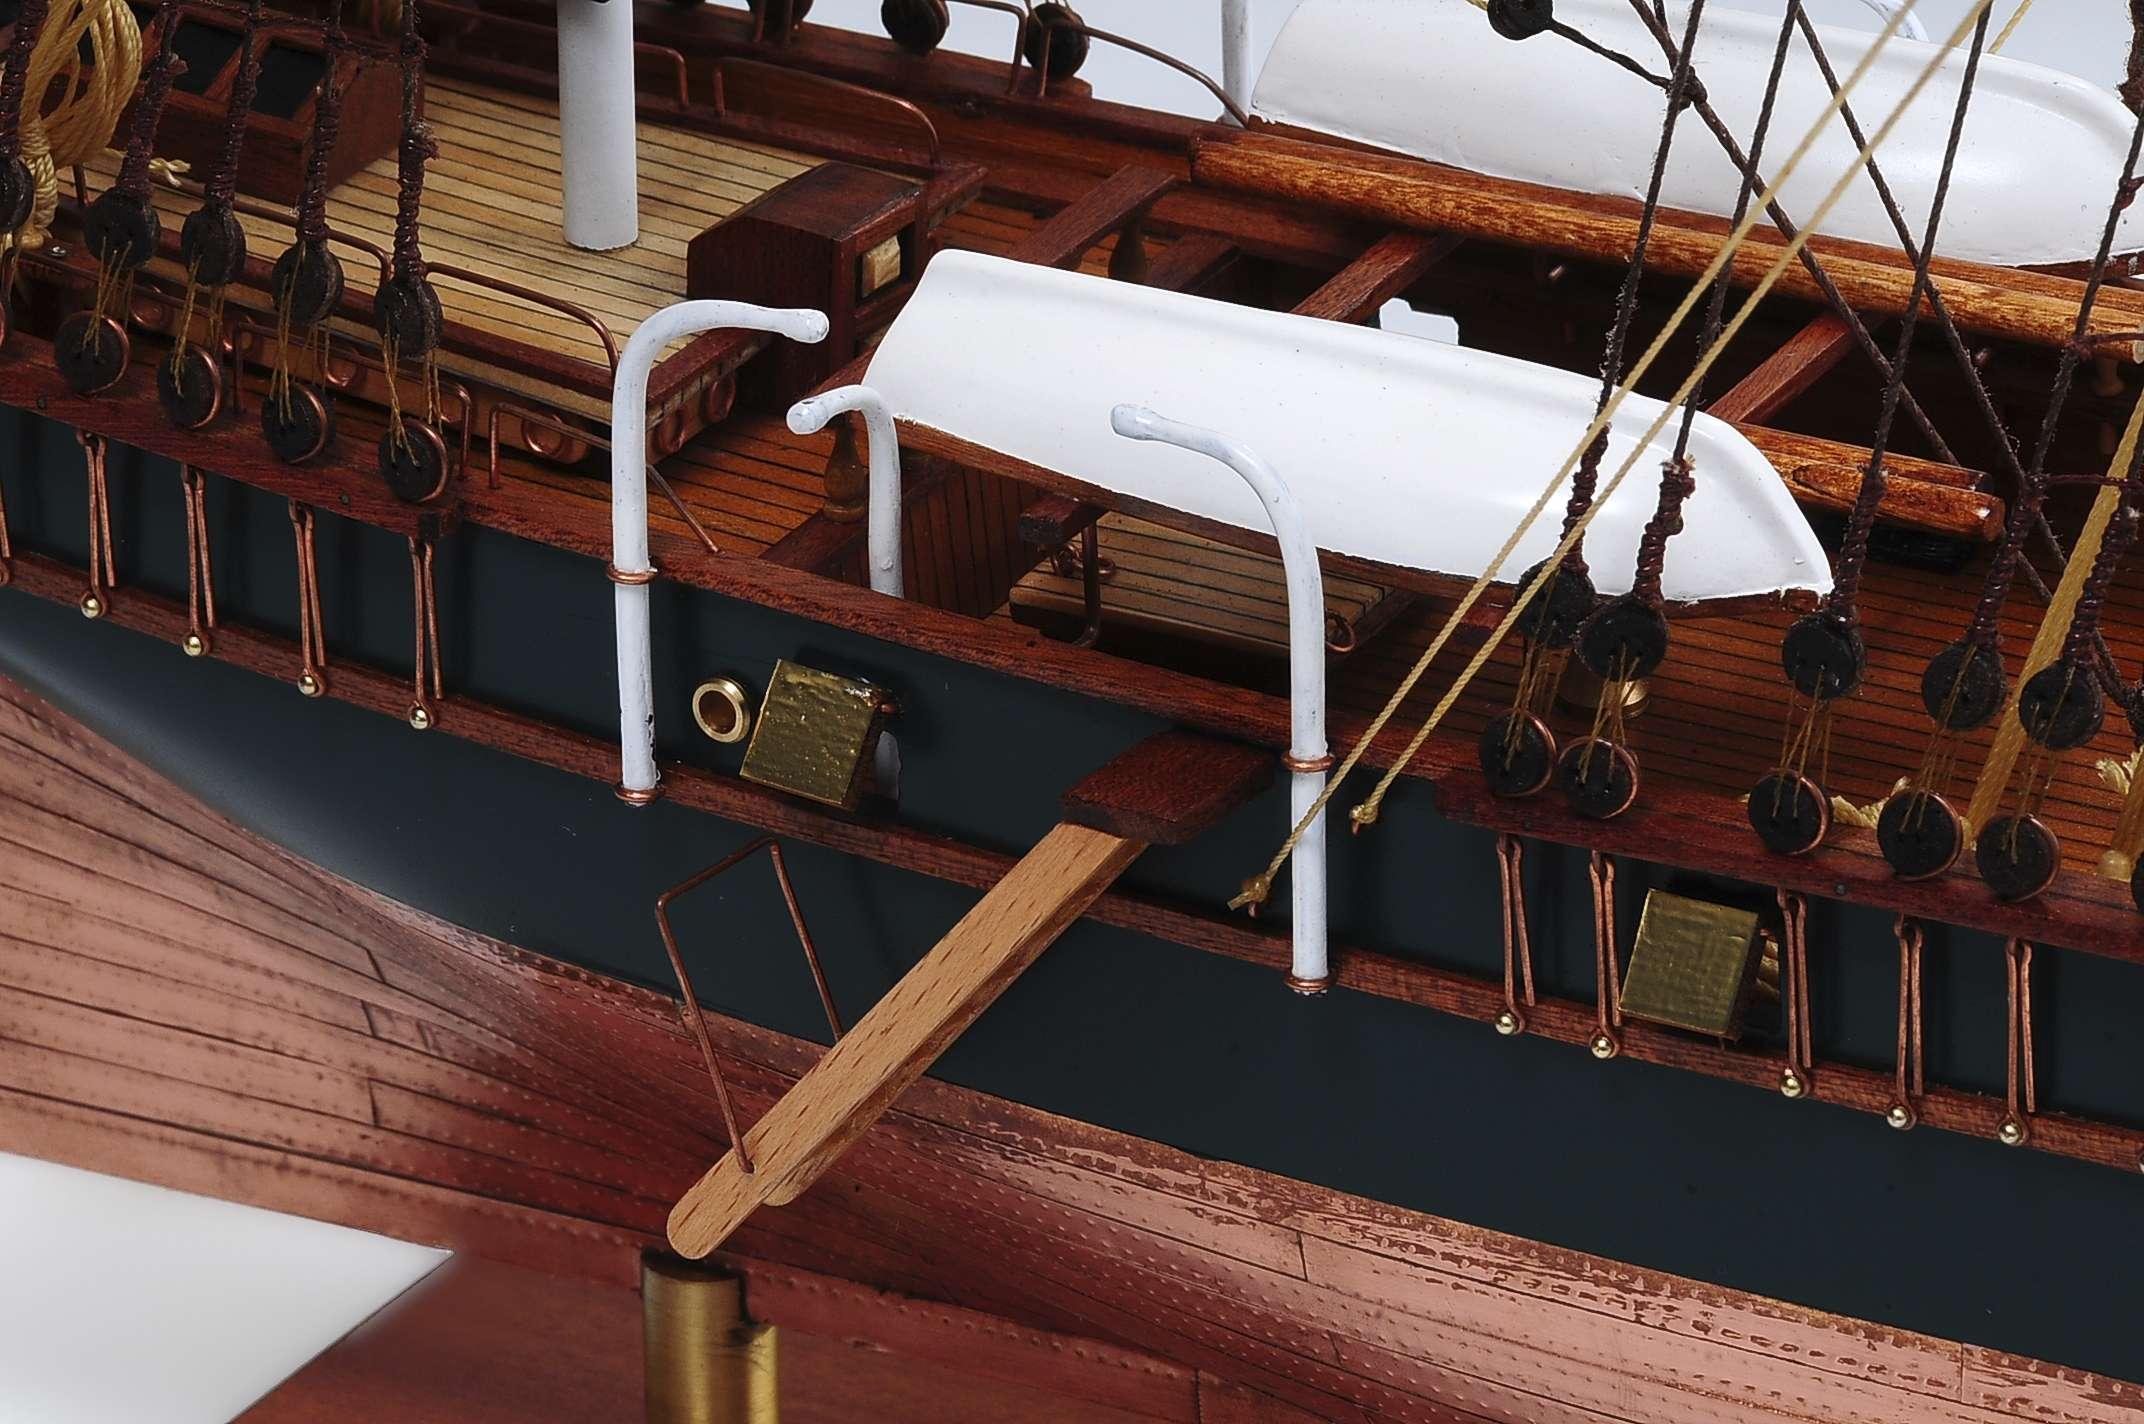 1434-4873-Thermopylae-Model-Boat